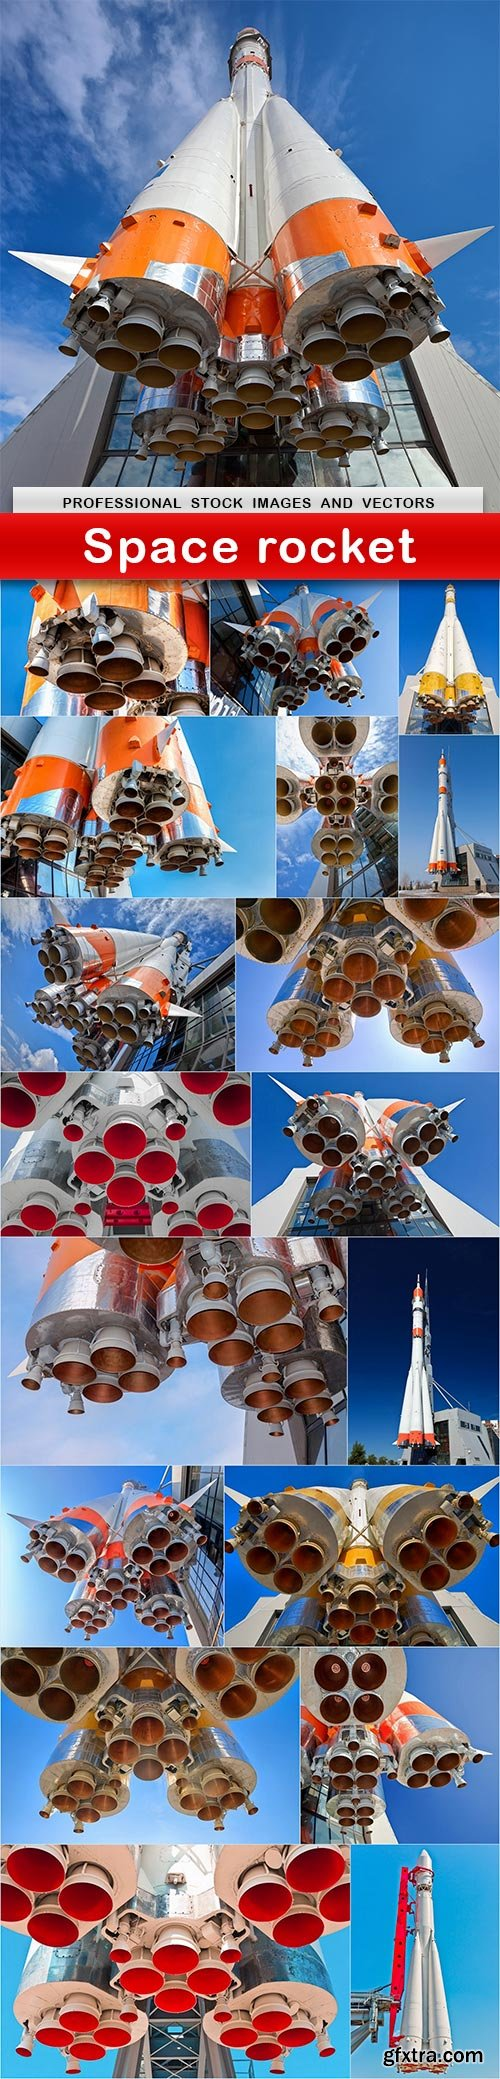 Space rocket - 19 UHQ JPEG